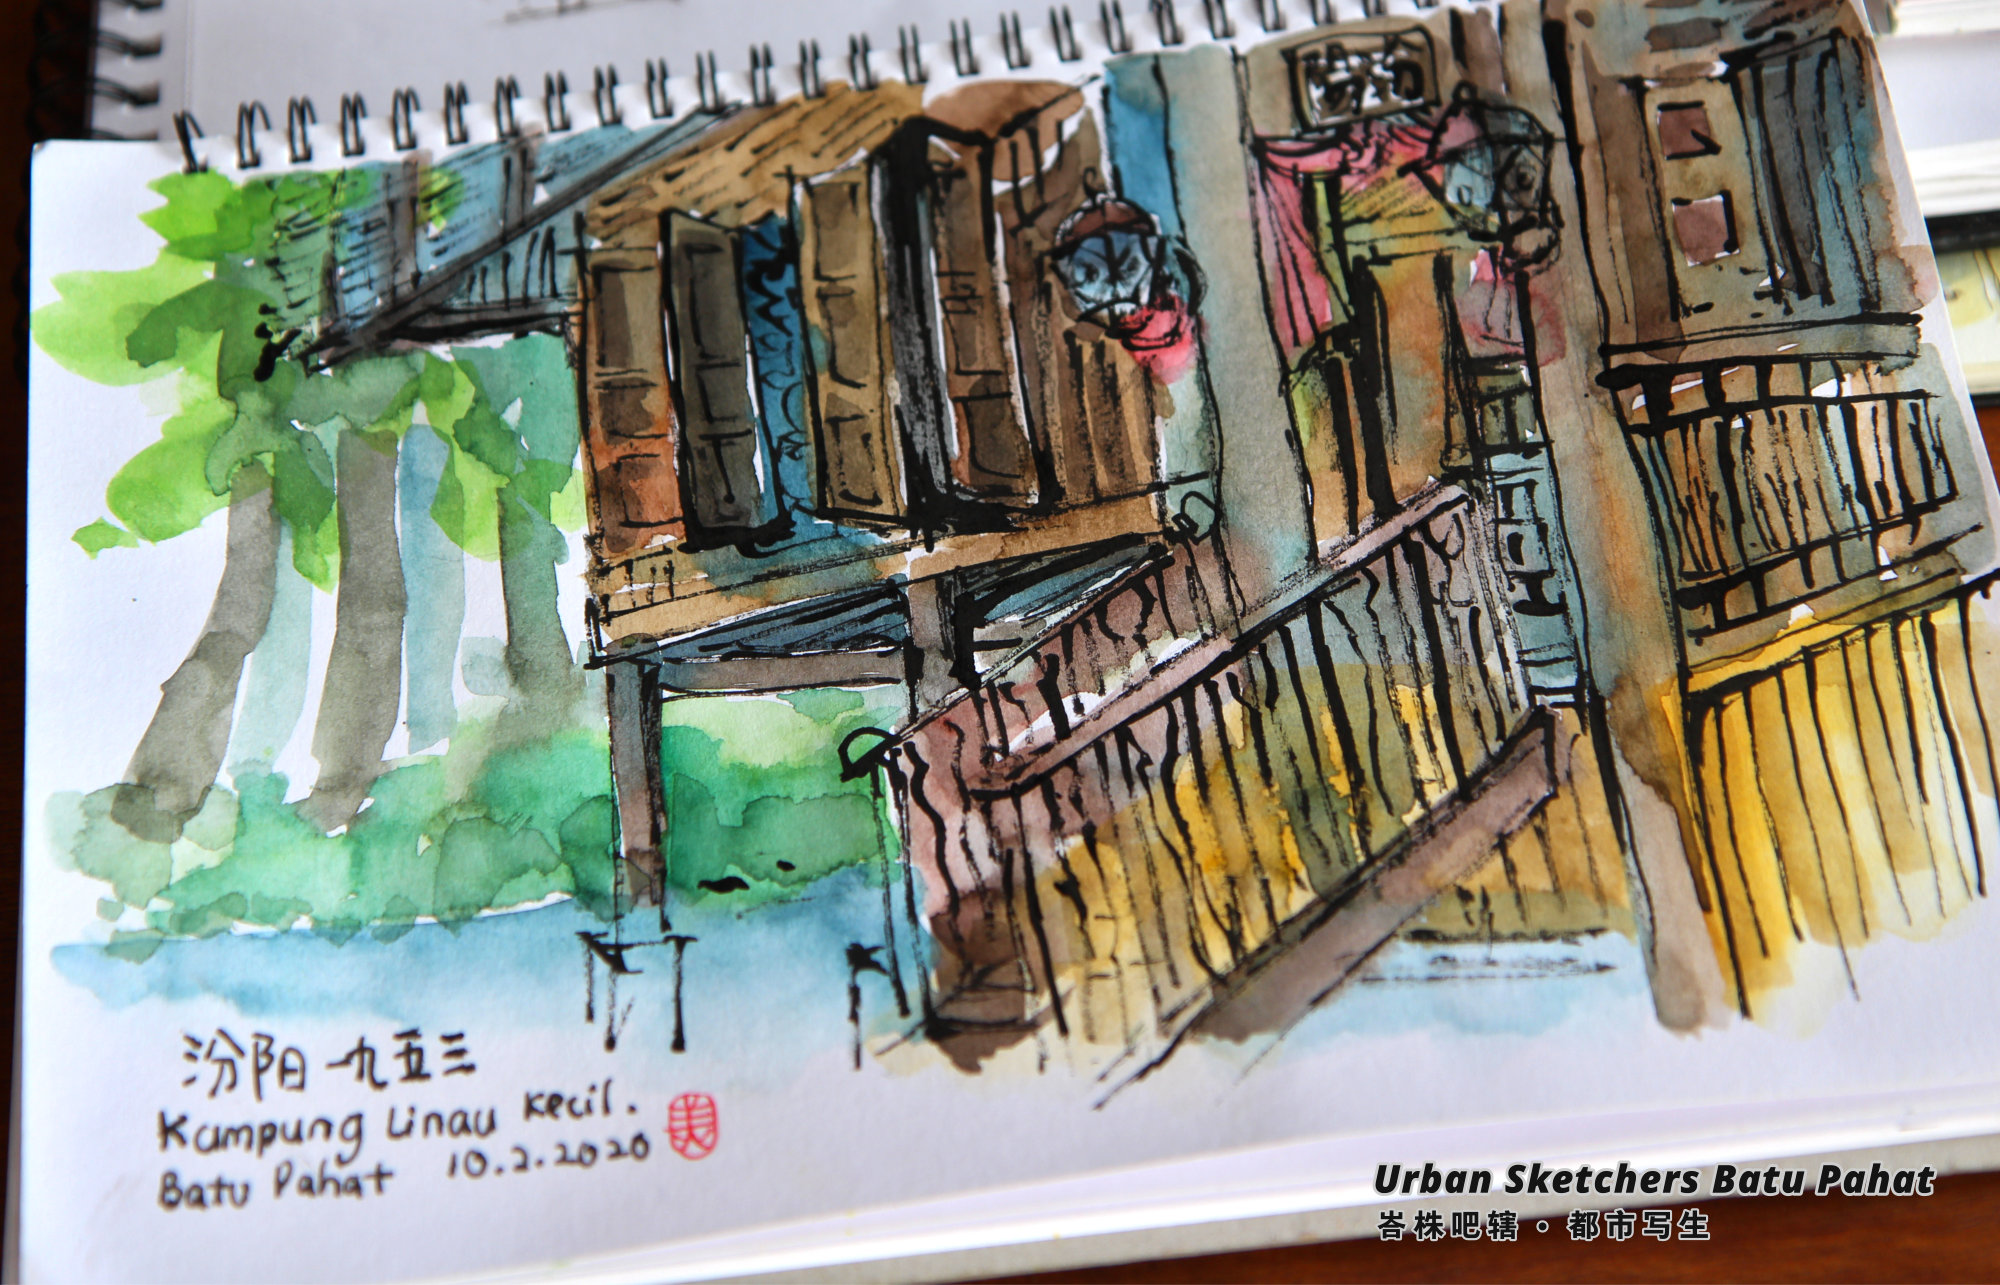 Urban Sketchers Batu Pahat Johor Malaysia Art Drawing Sketching 马来西亚 柔佛 峇株吧辖都市写生 艺术 画画 A013